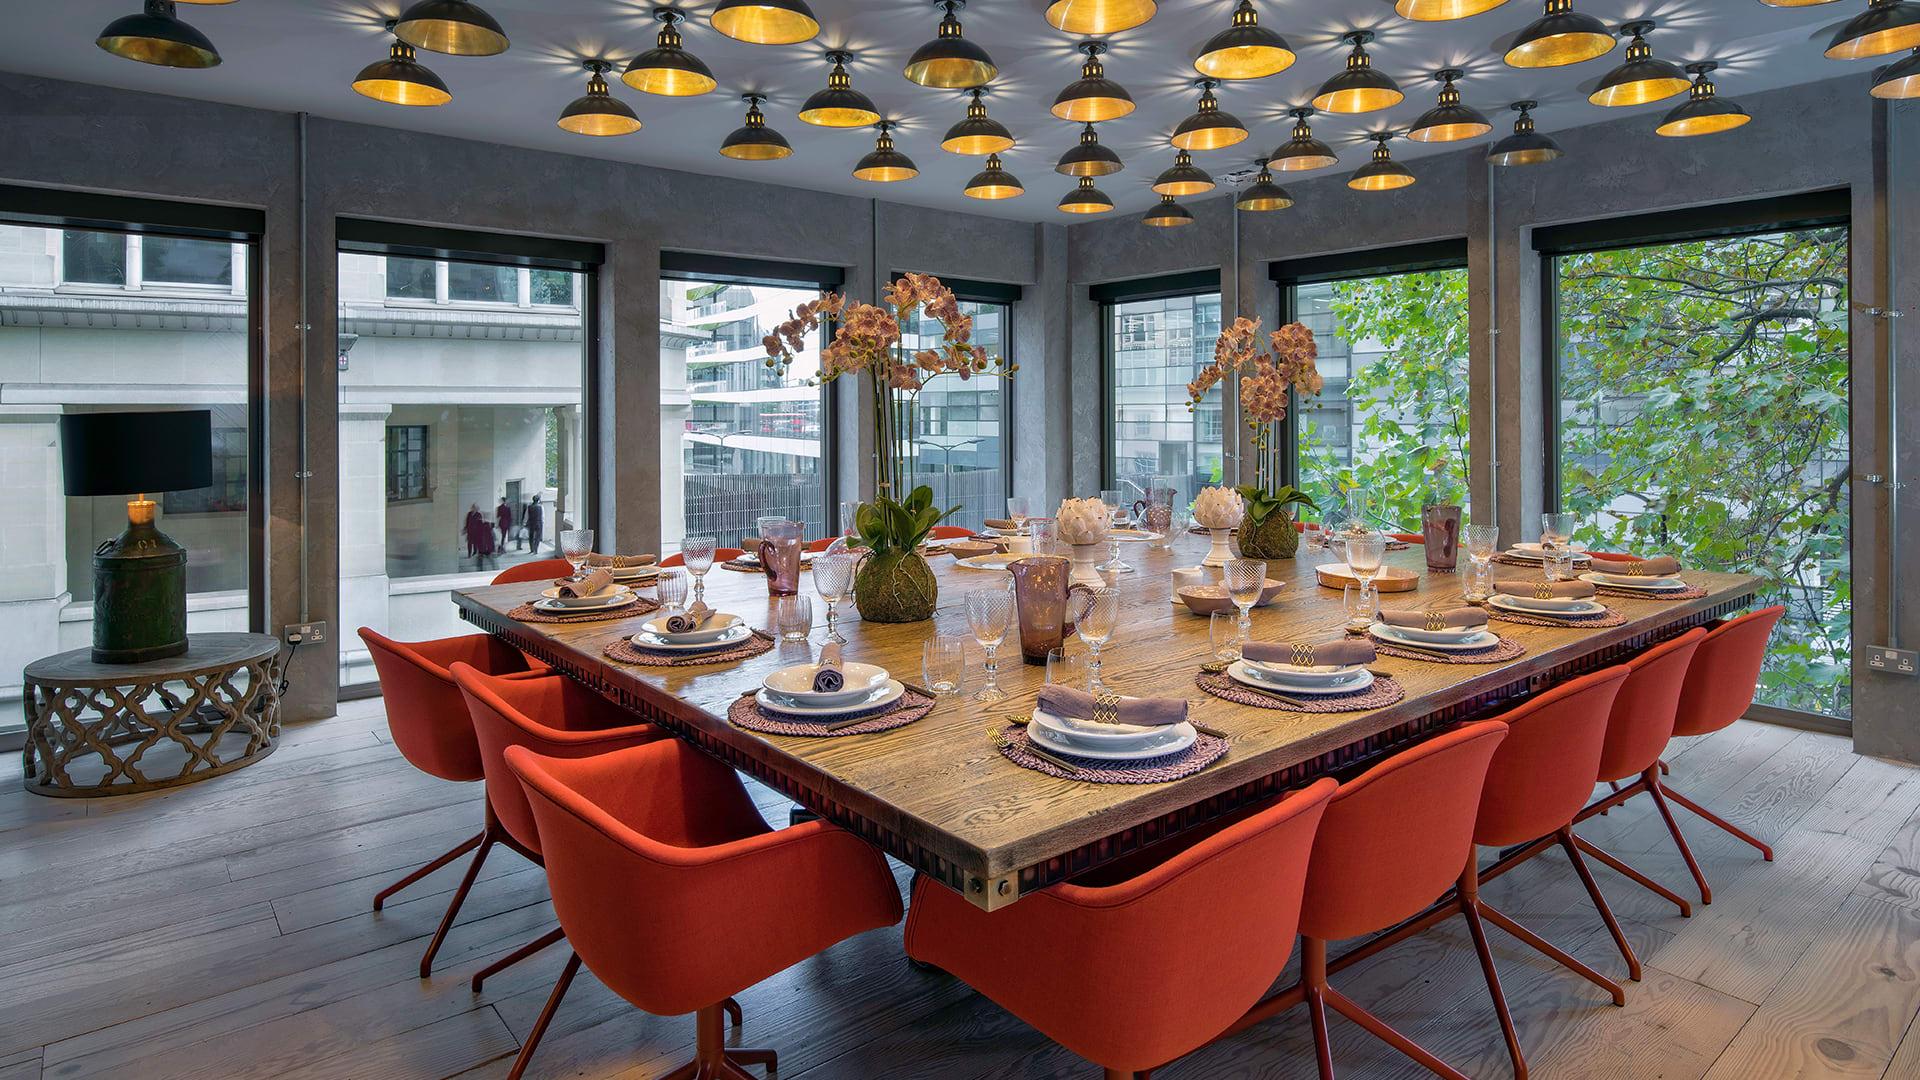 Steel VIntage   Case Study - Ocubis   Industrial Boardroom Tables